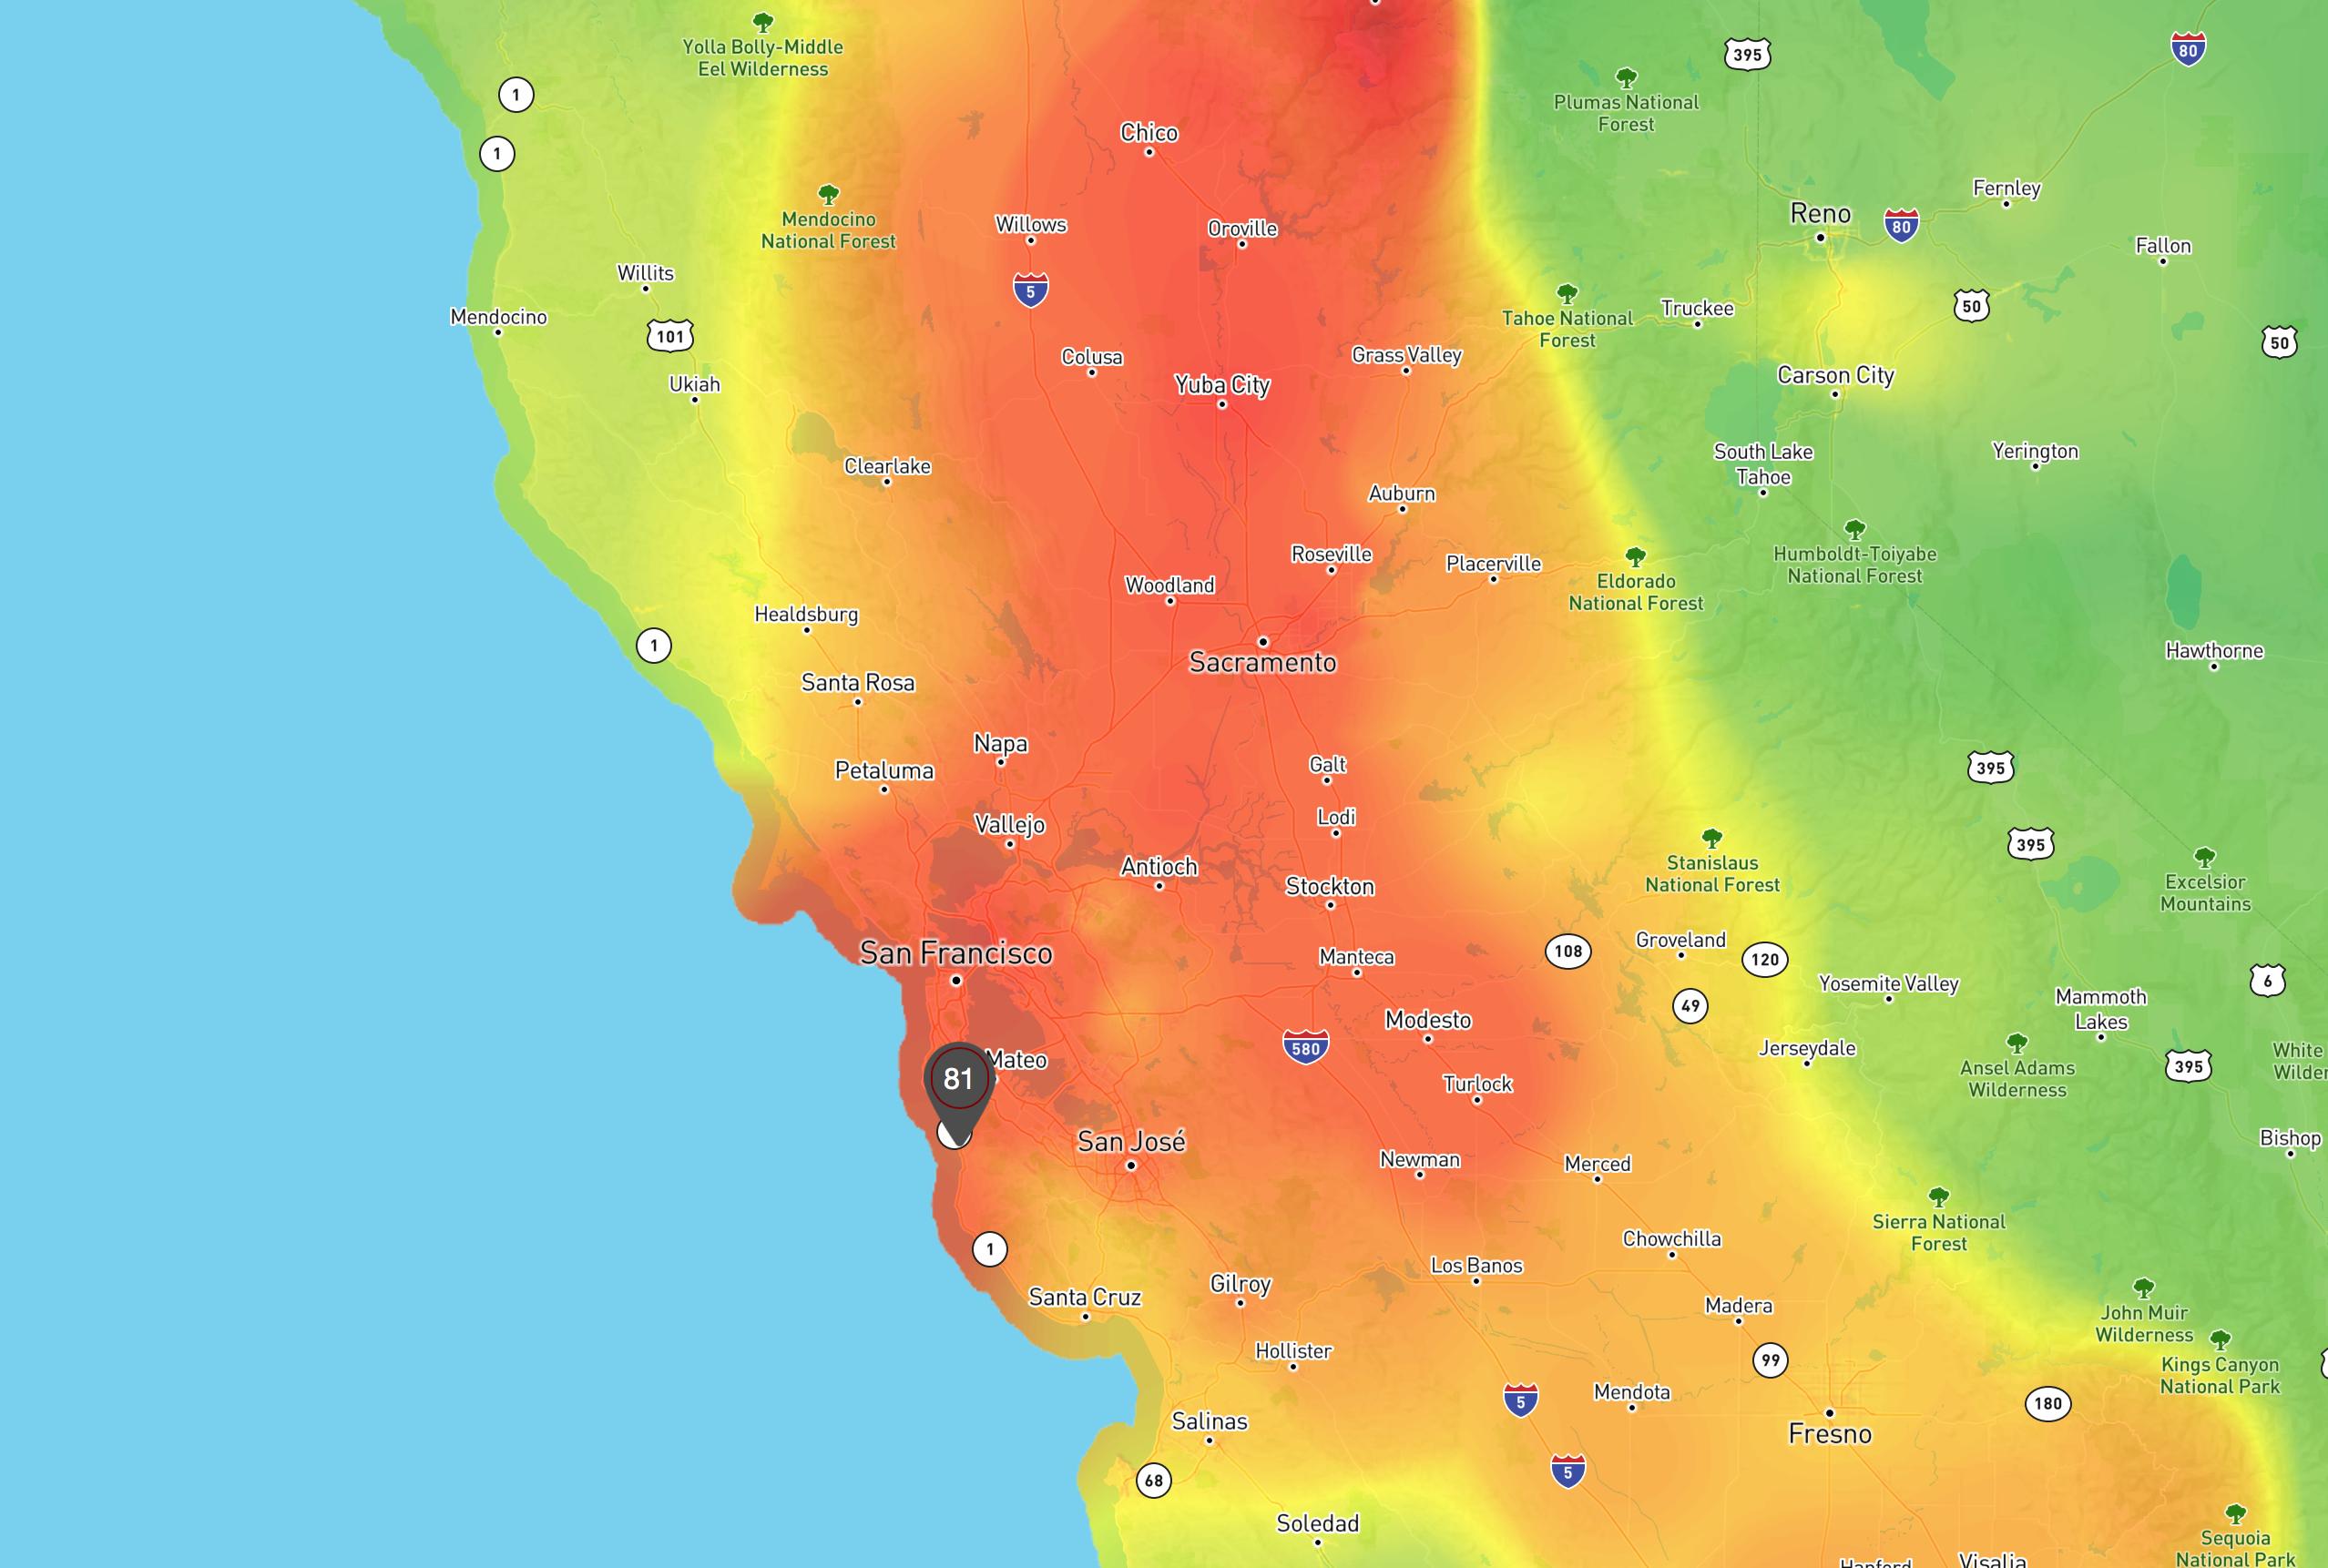 Loopy Maps to Rationalize Random Shut-Offs?